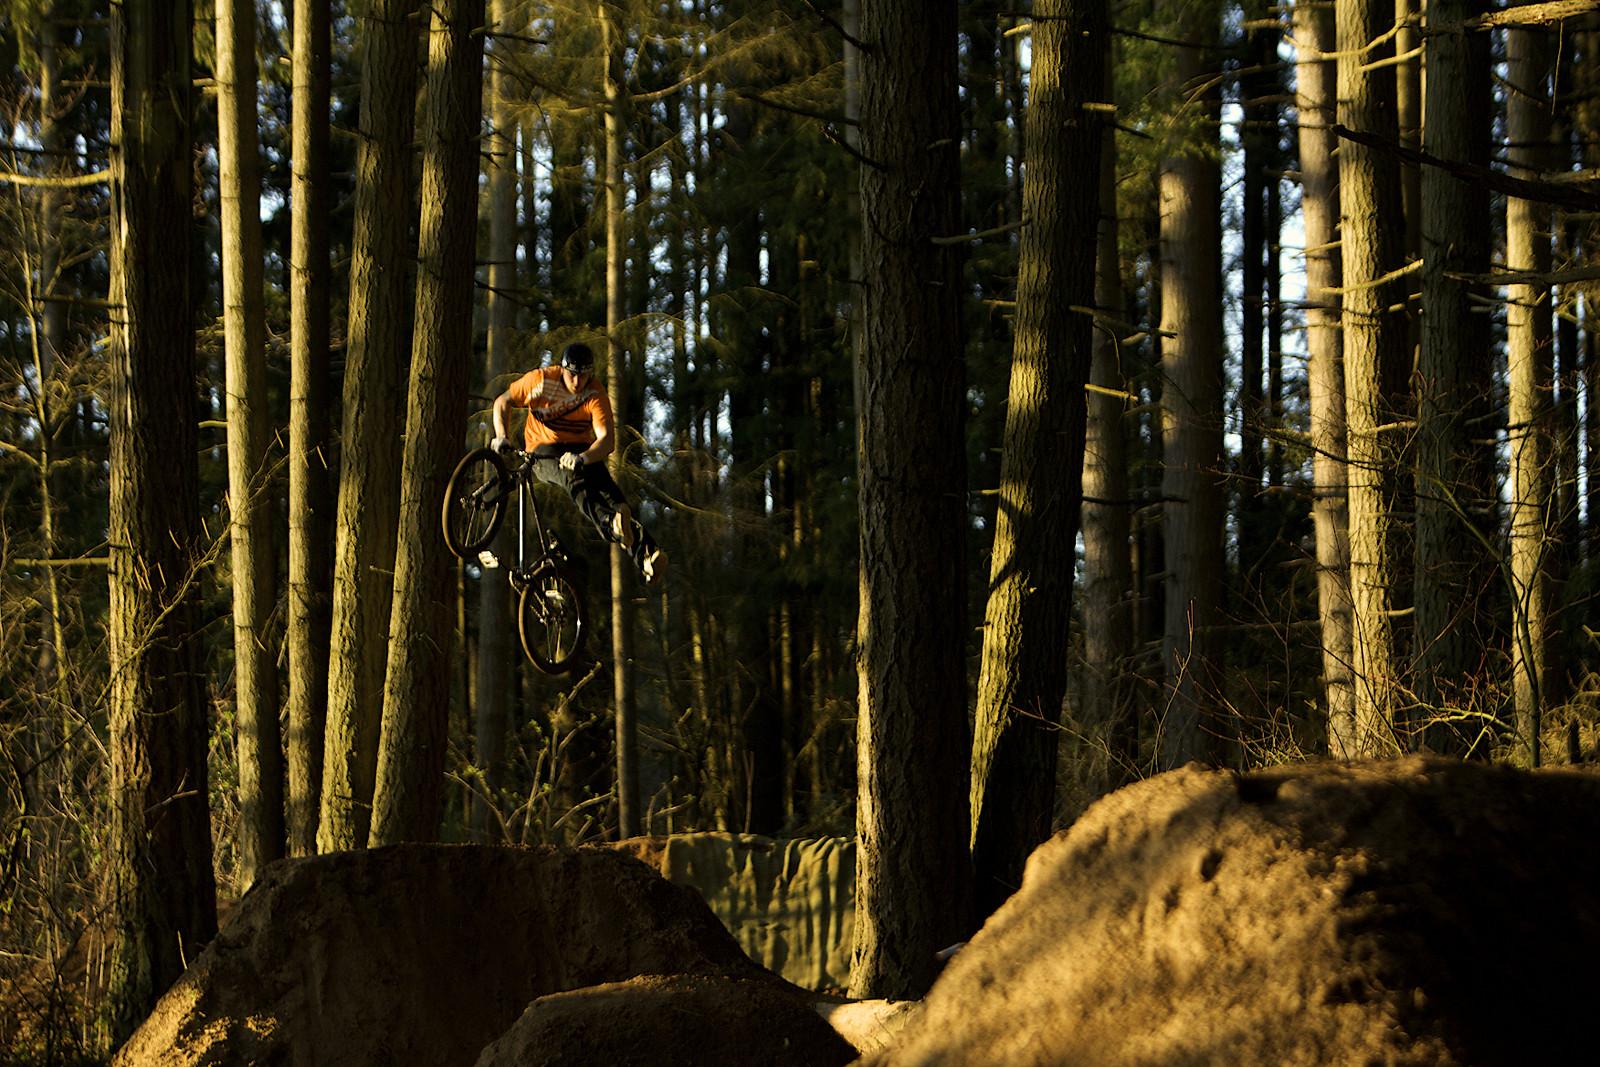 Sundbaum Monroe Tepper - corytepper.com - Mountain Biking Pictures - Vital MTB